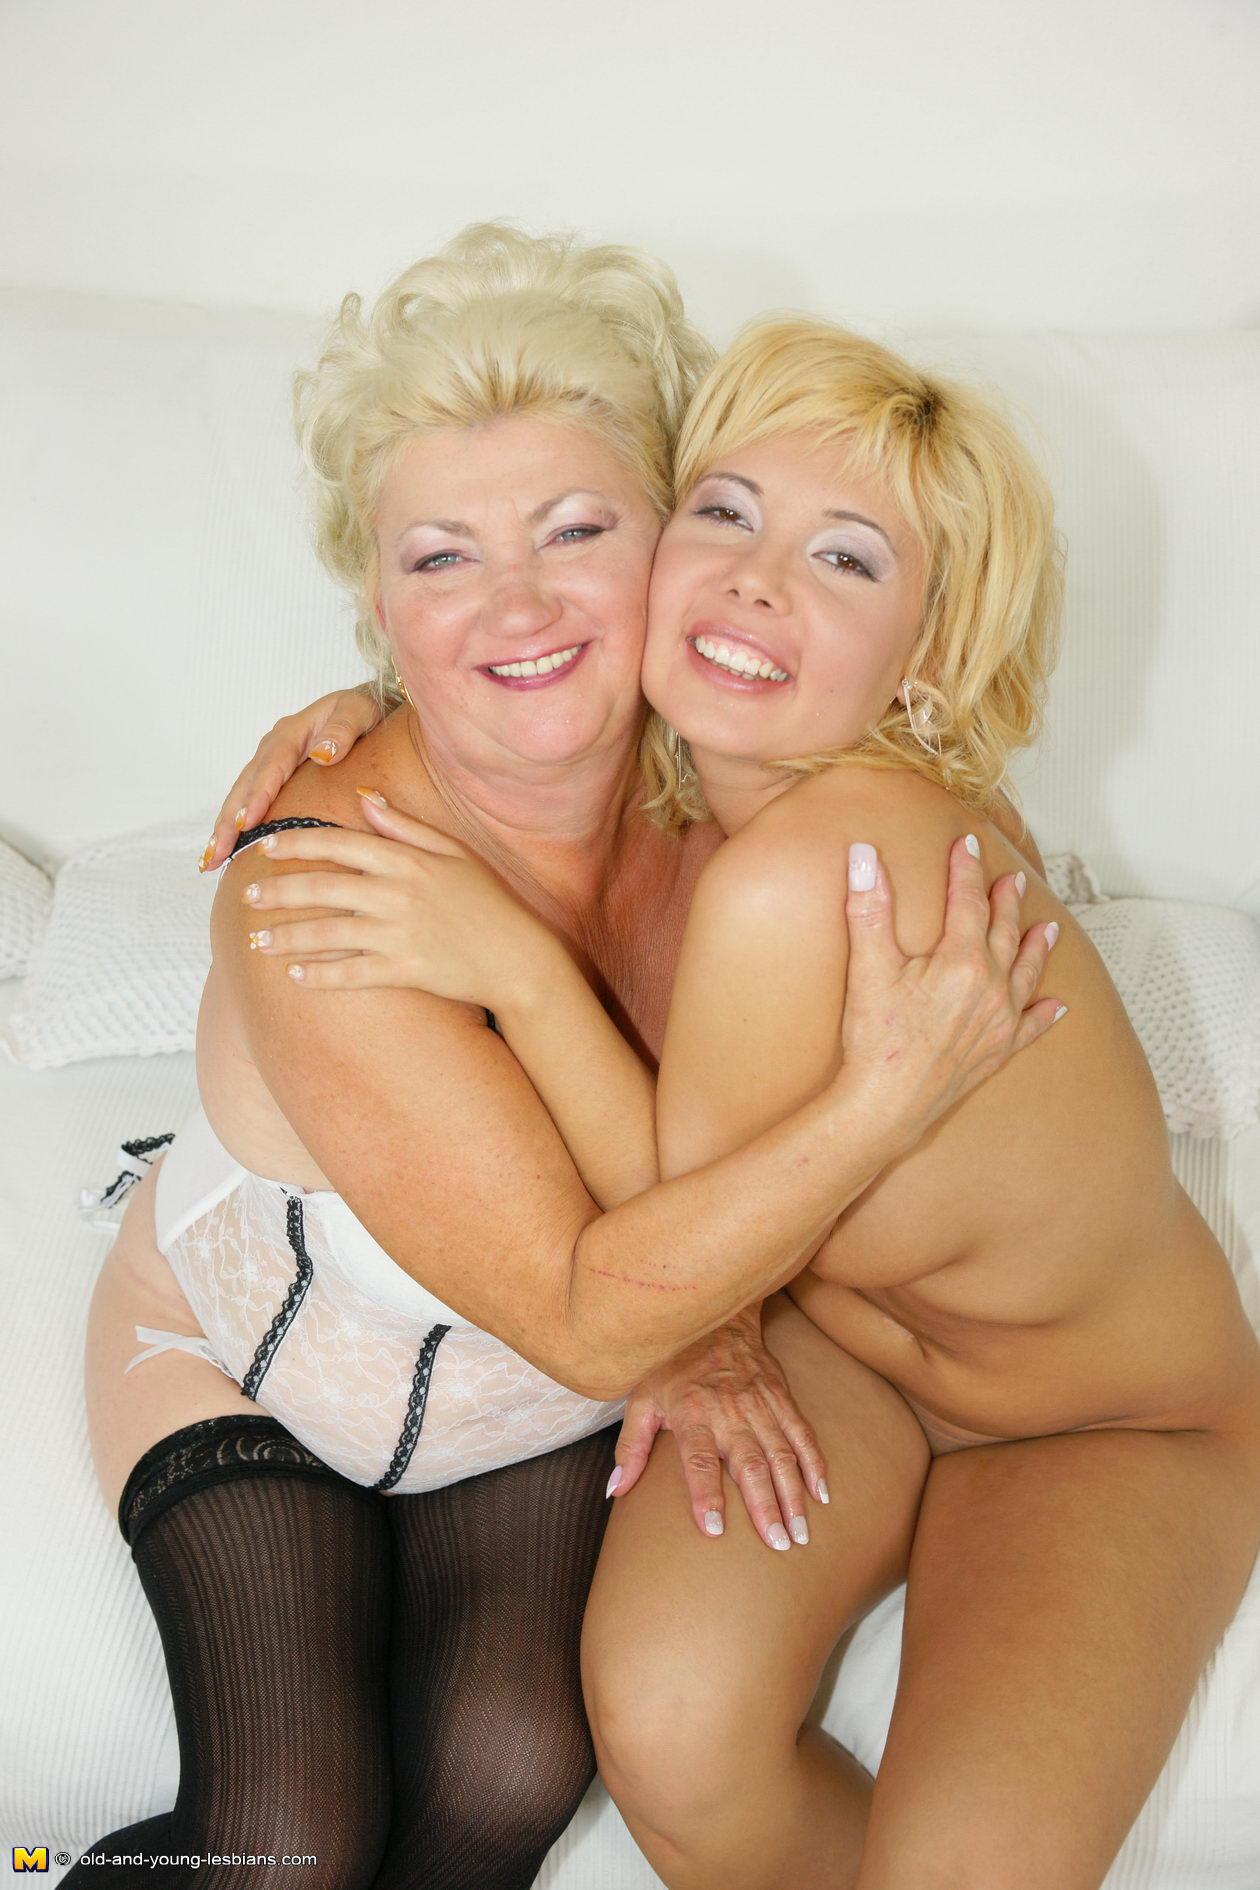 Viejas lesbianas fotos tgp